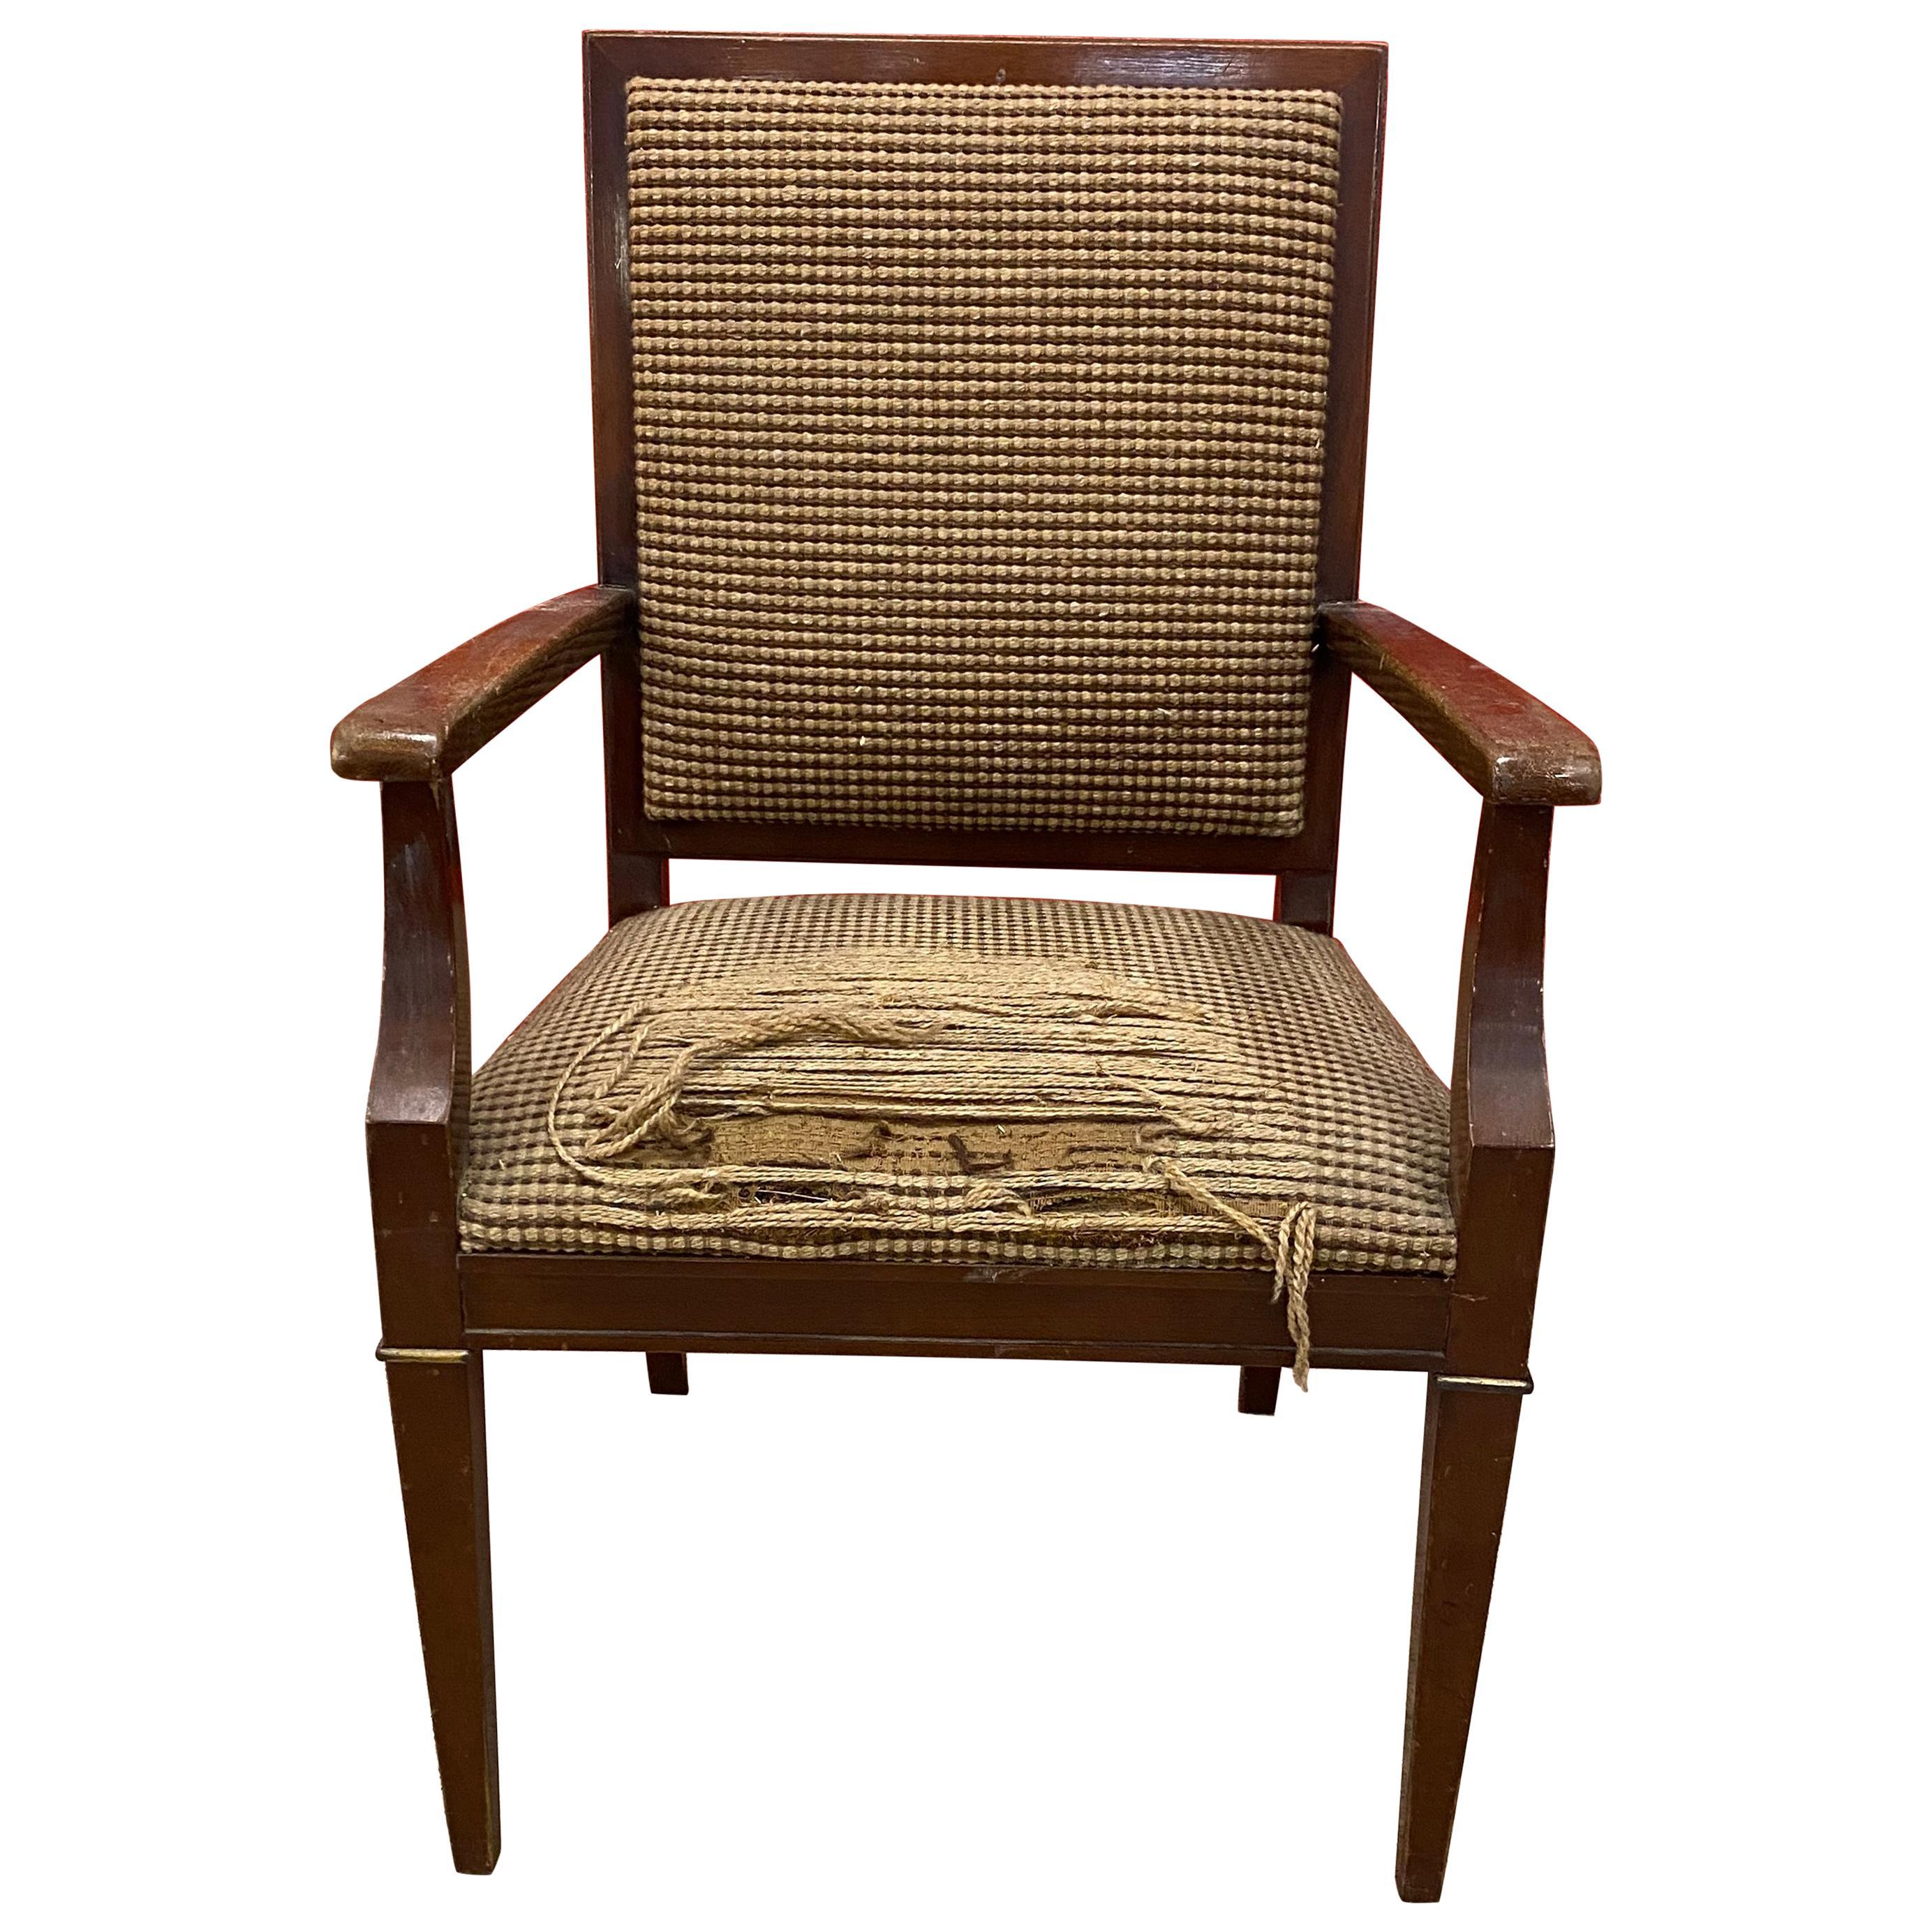 Decoene Freres , 1940s French Art Deco Armchair